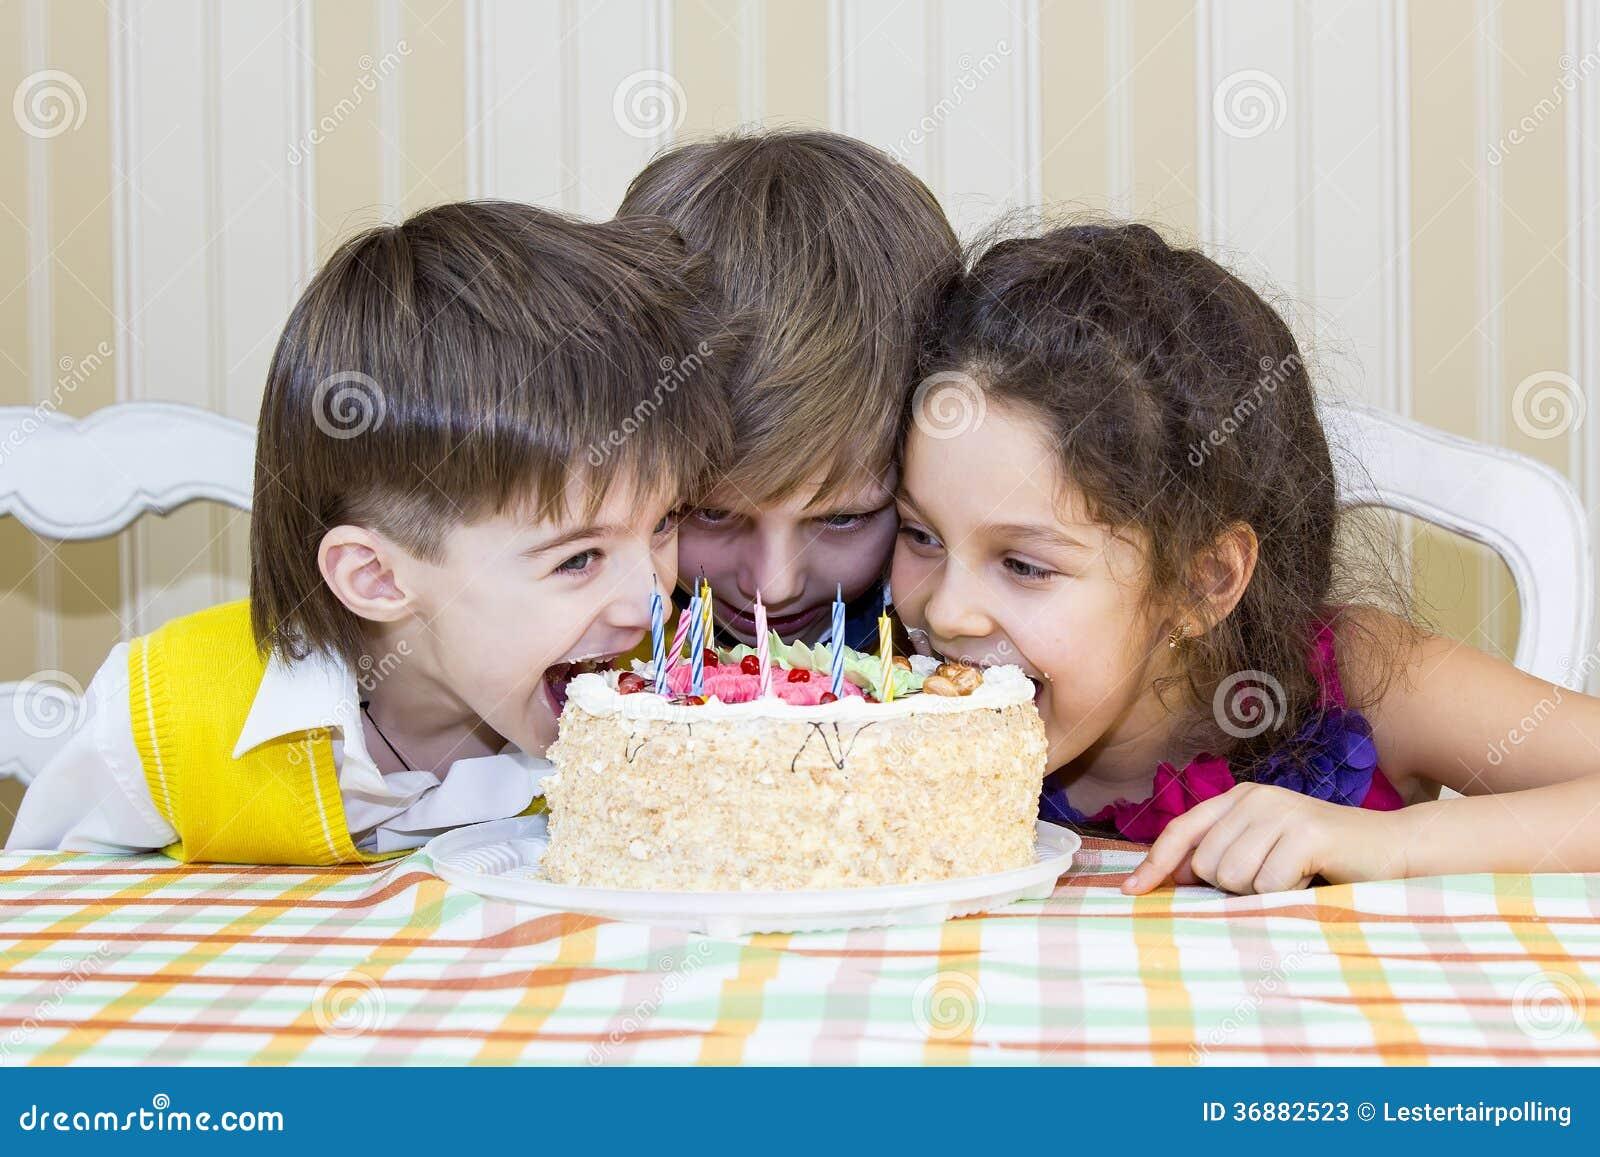 Happy Fat Kid Eating Cake